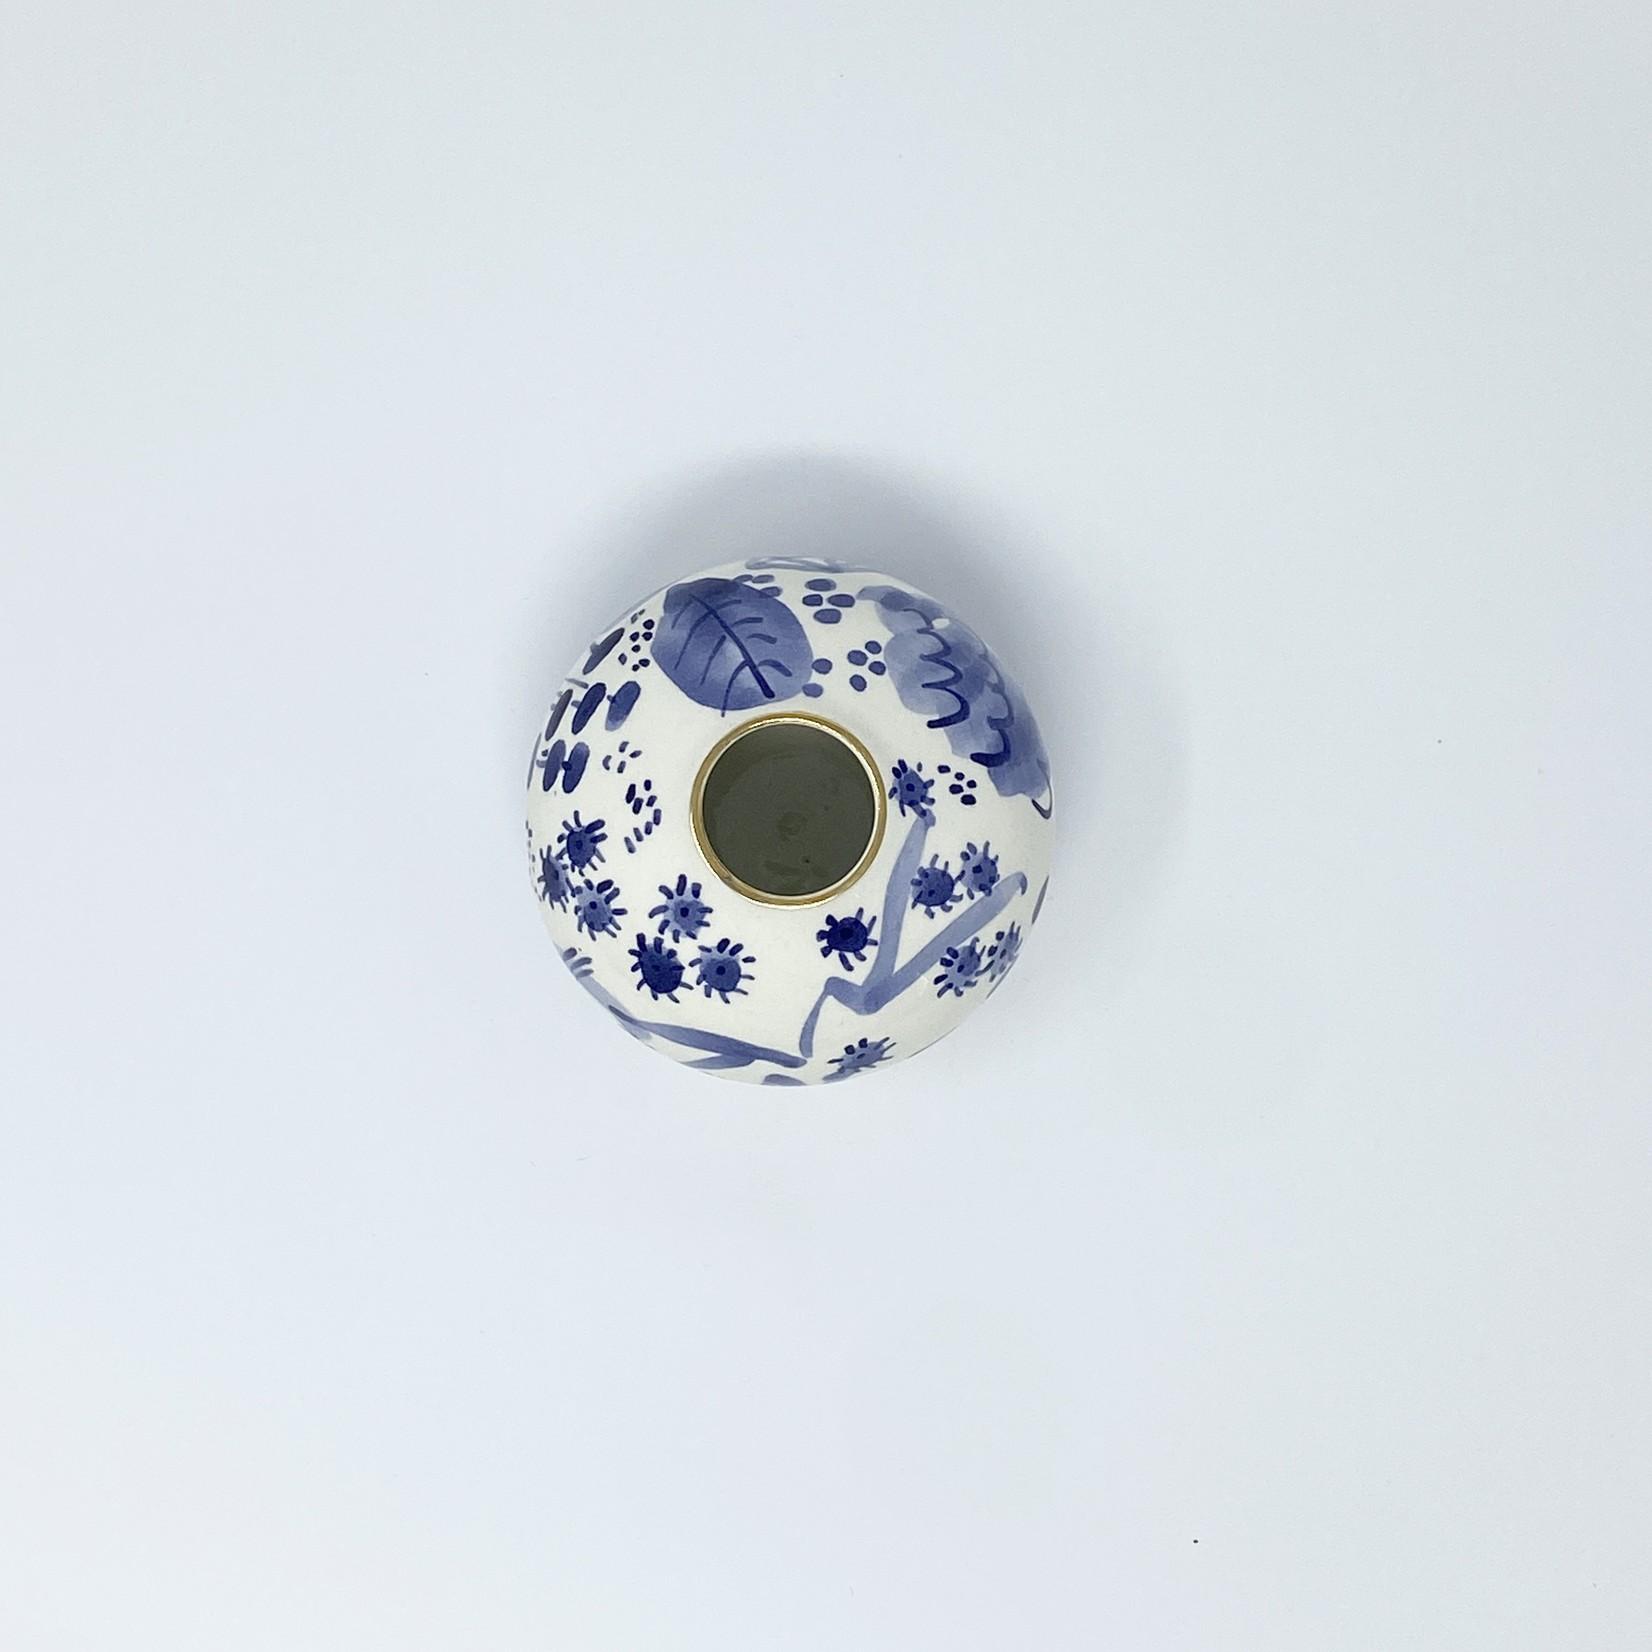 Jill Rosenwald Handmade Bud Vases